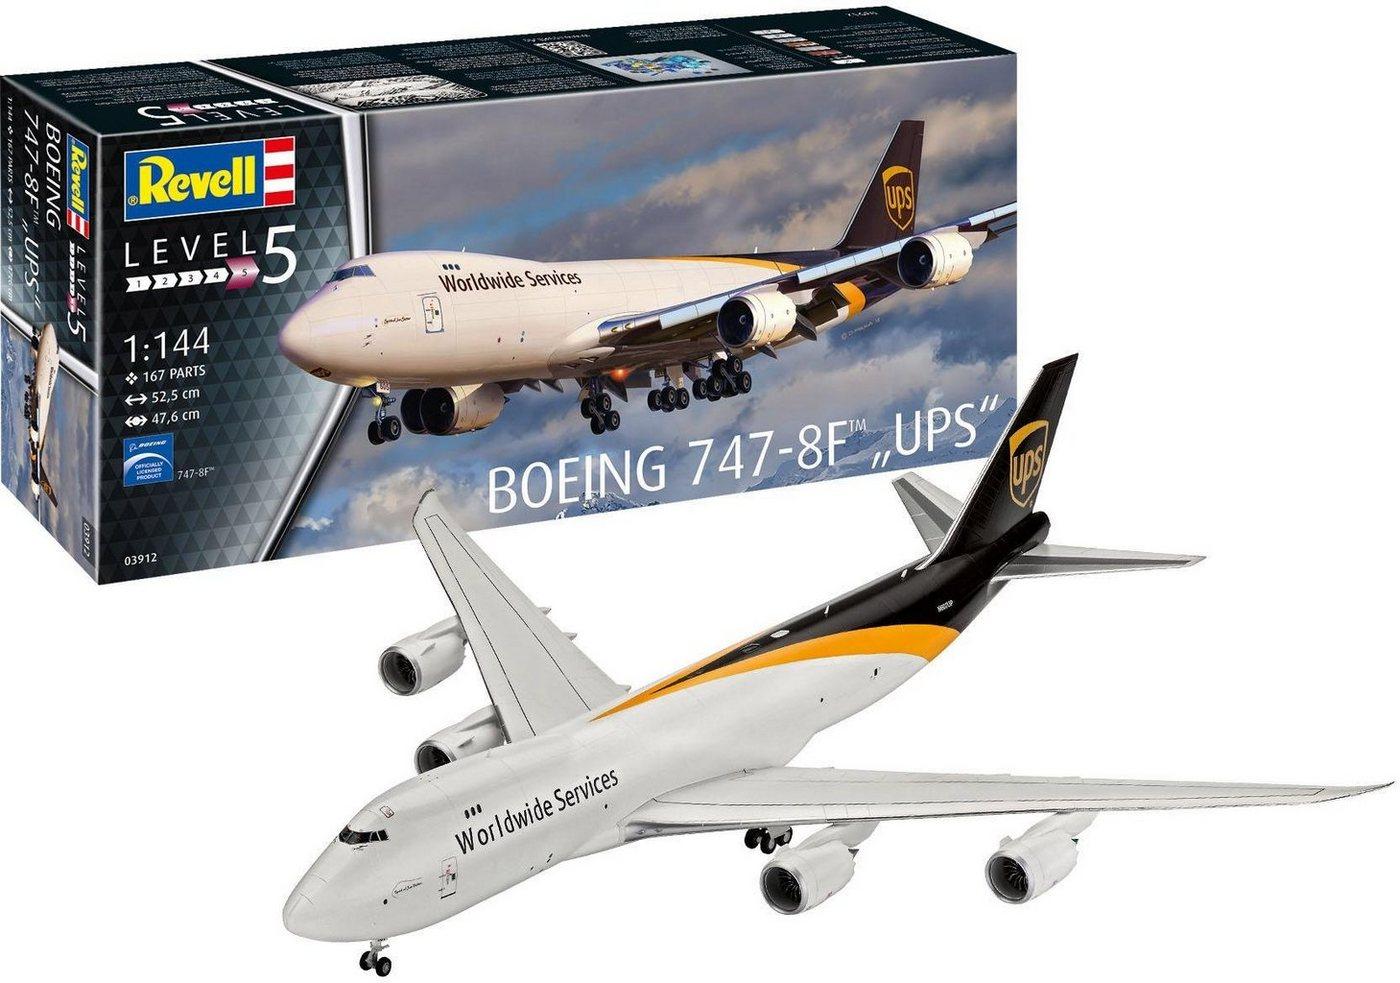 Revell Modellbausatz Flugzeug, Maßstab 1:144, »Boeing 747-8F UPS«